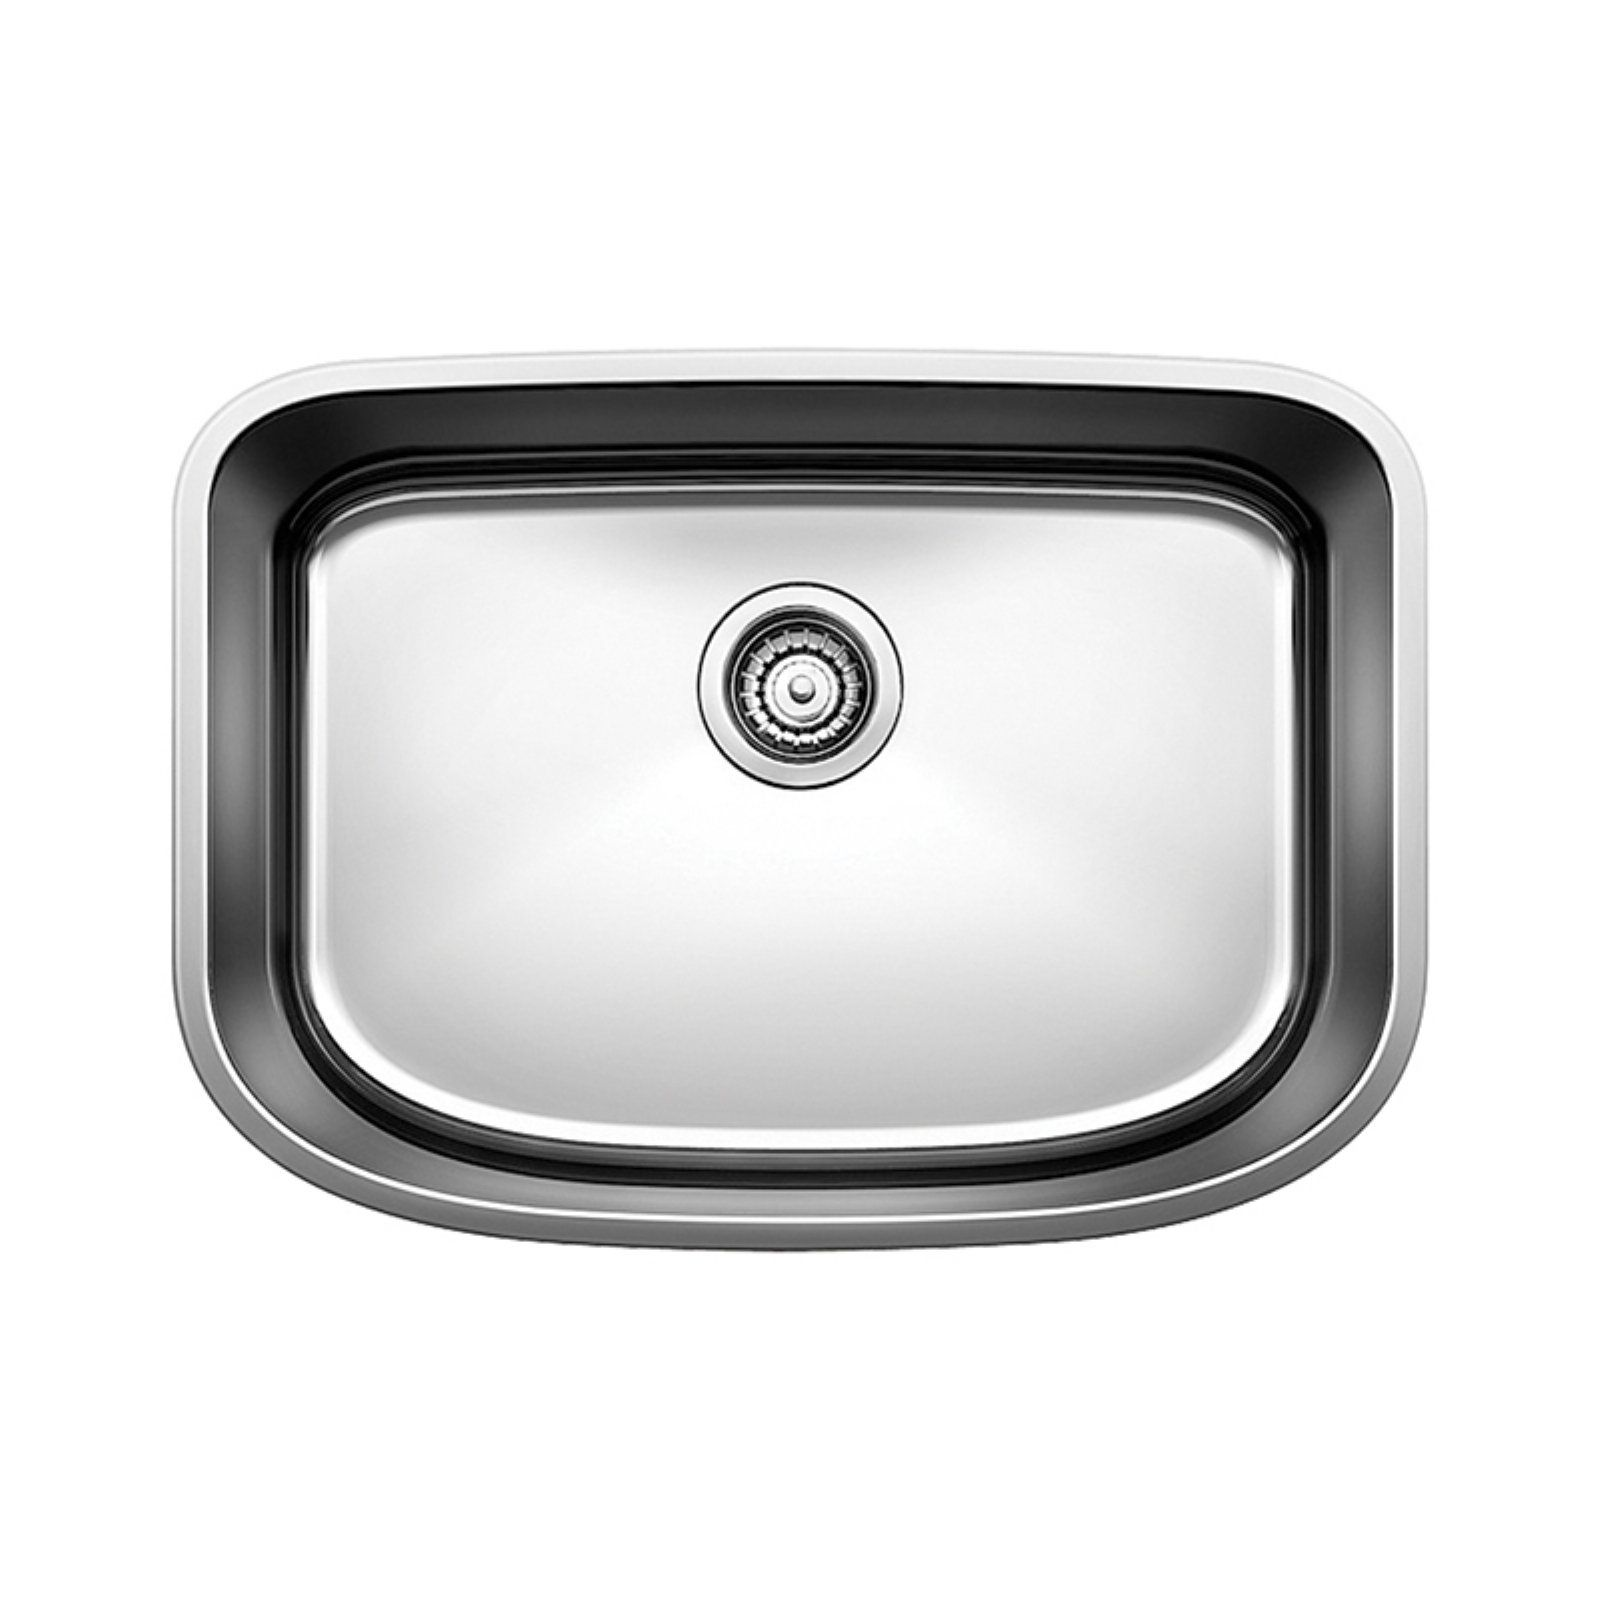 Blanco One 25 In Single Basin Undermount Kitchen Sink Stainless